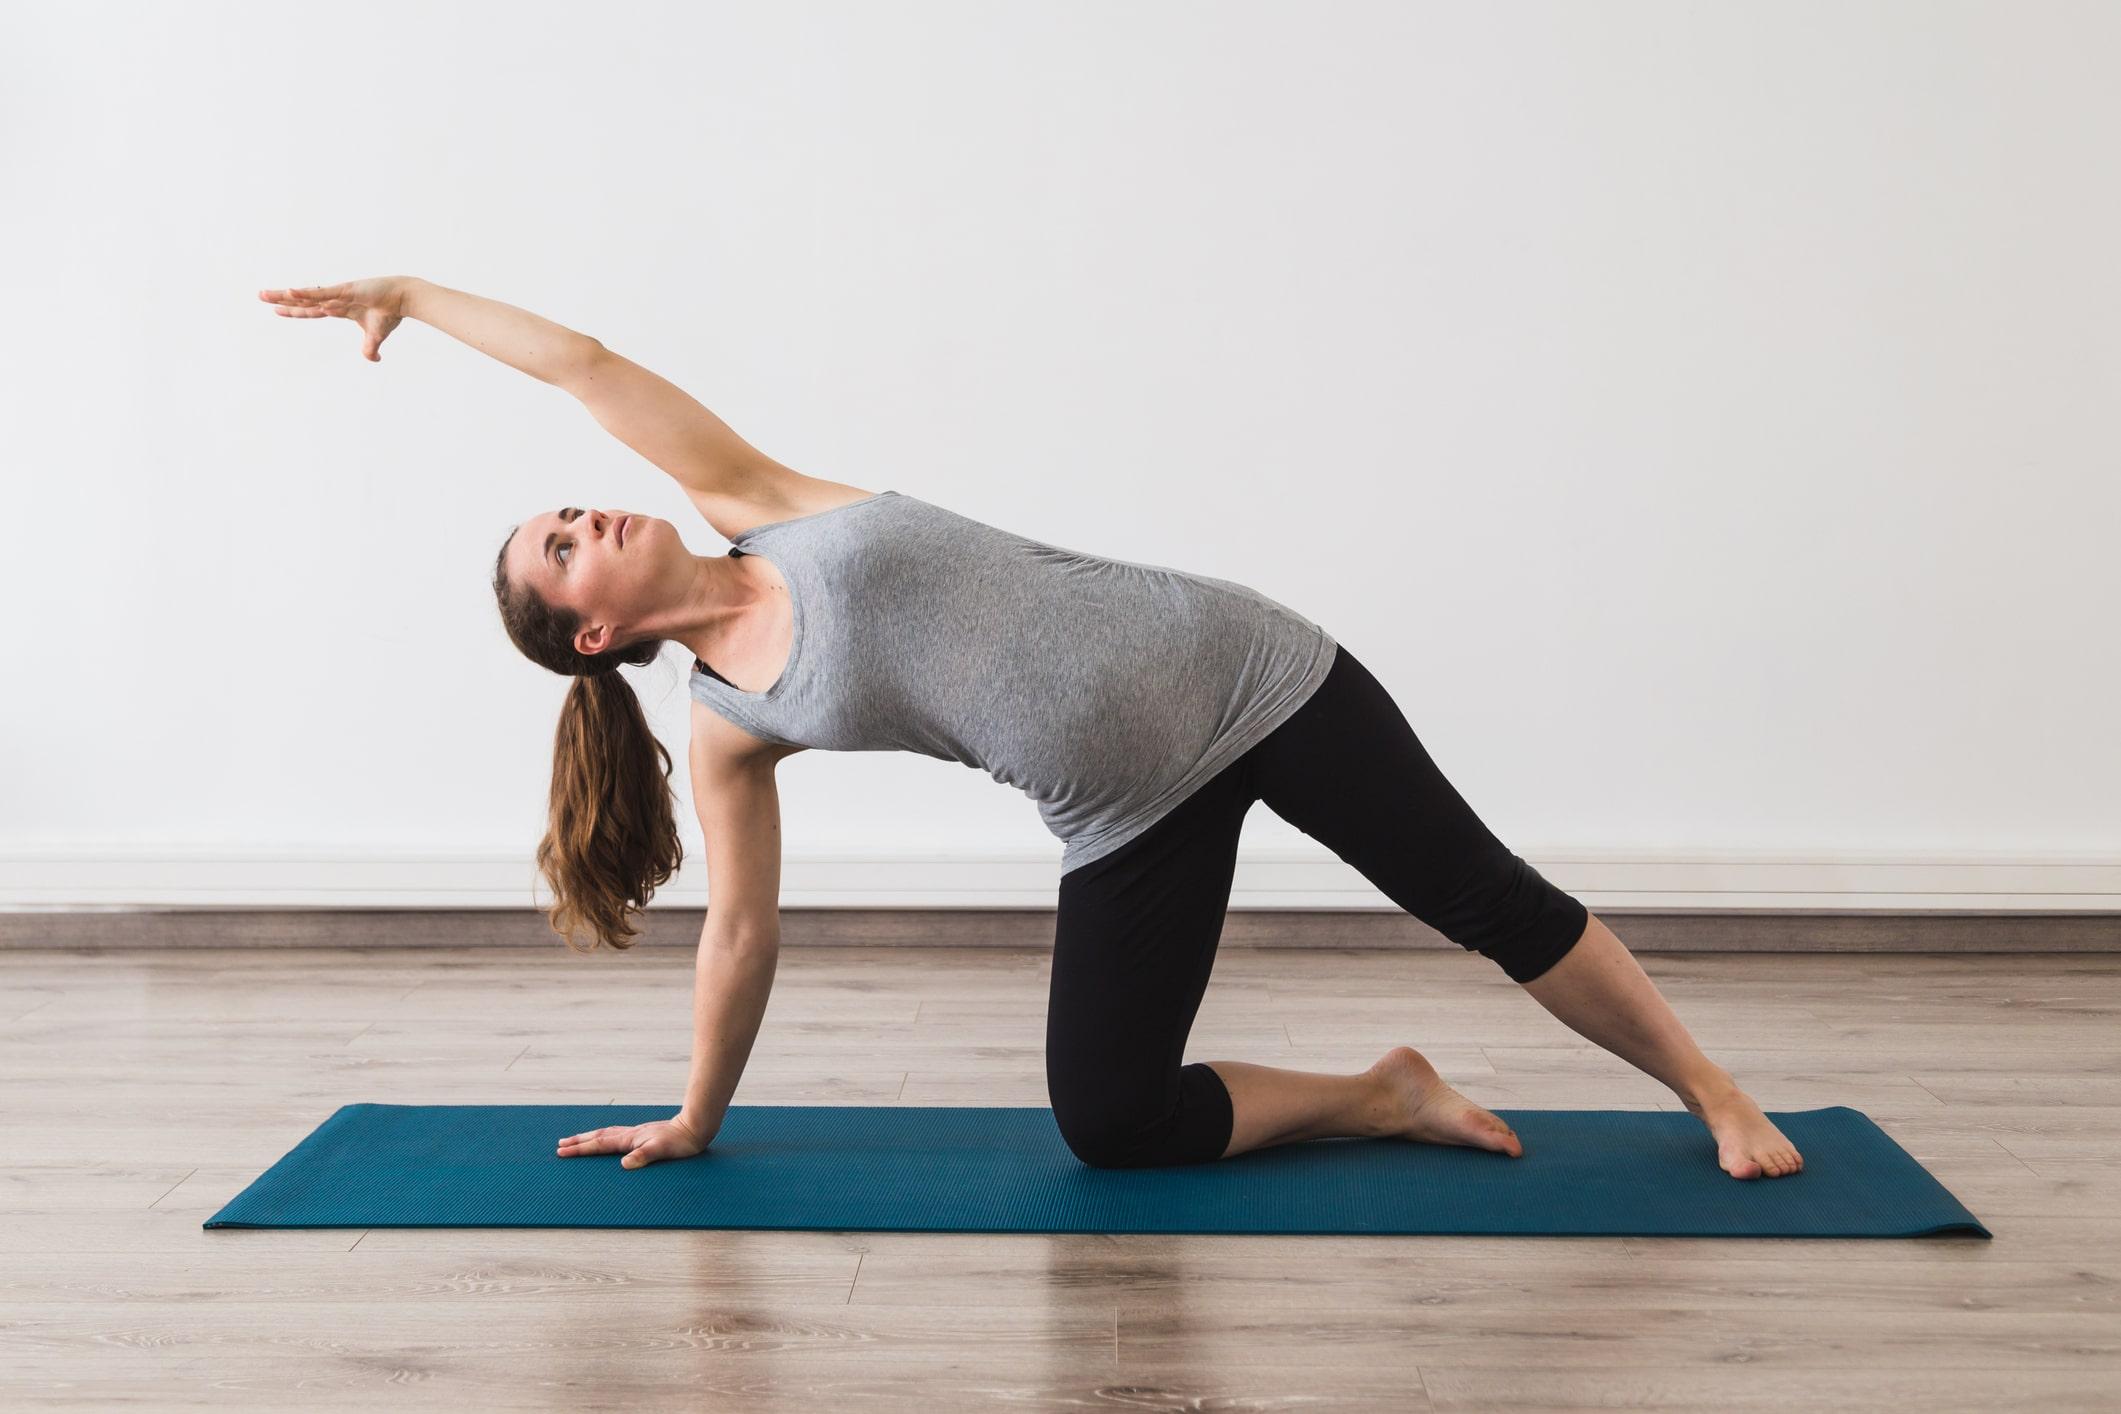 Fitness photography poses strength photo shoot 43 ideas